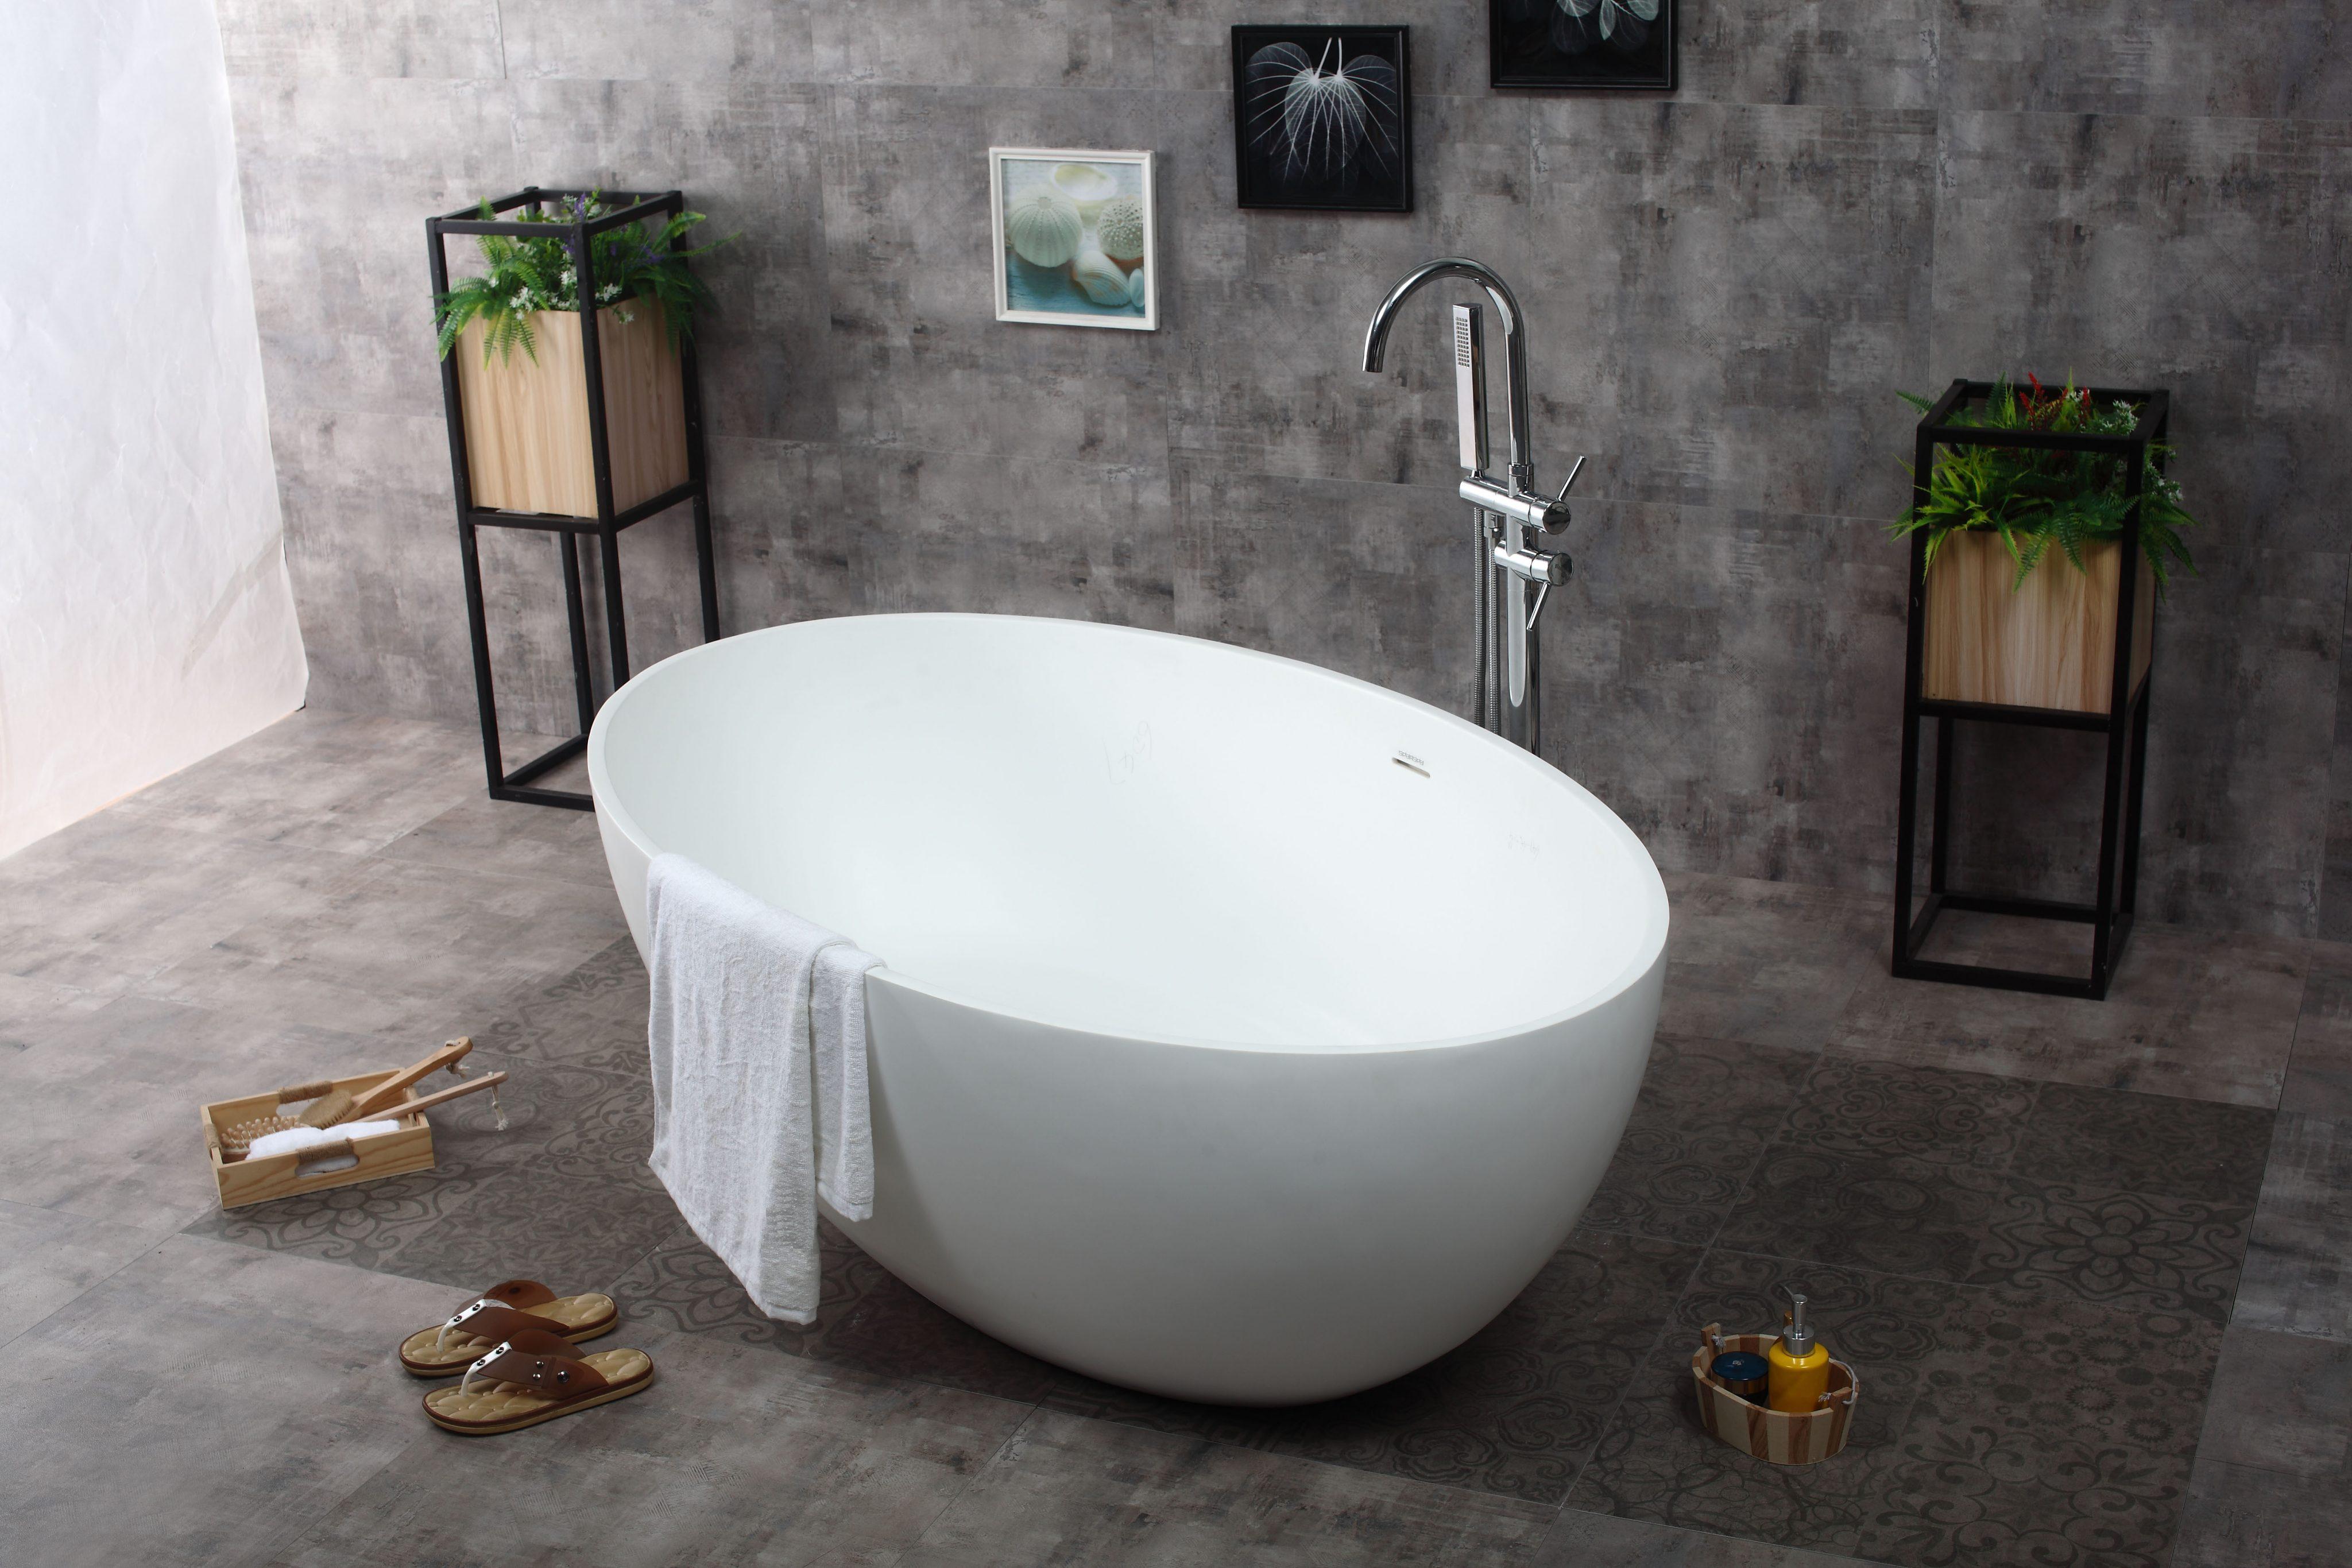 Baignoire corian 05 67 x 39 bouticcelli - Corian salle de bain ...